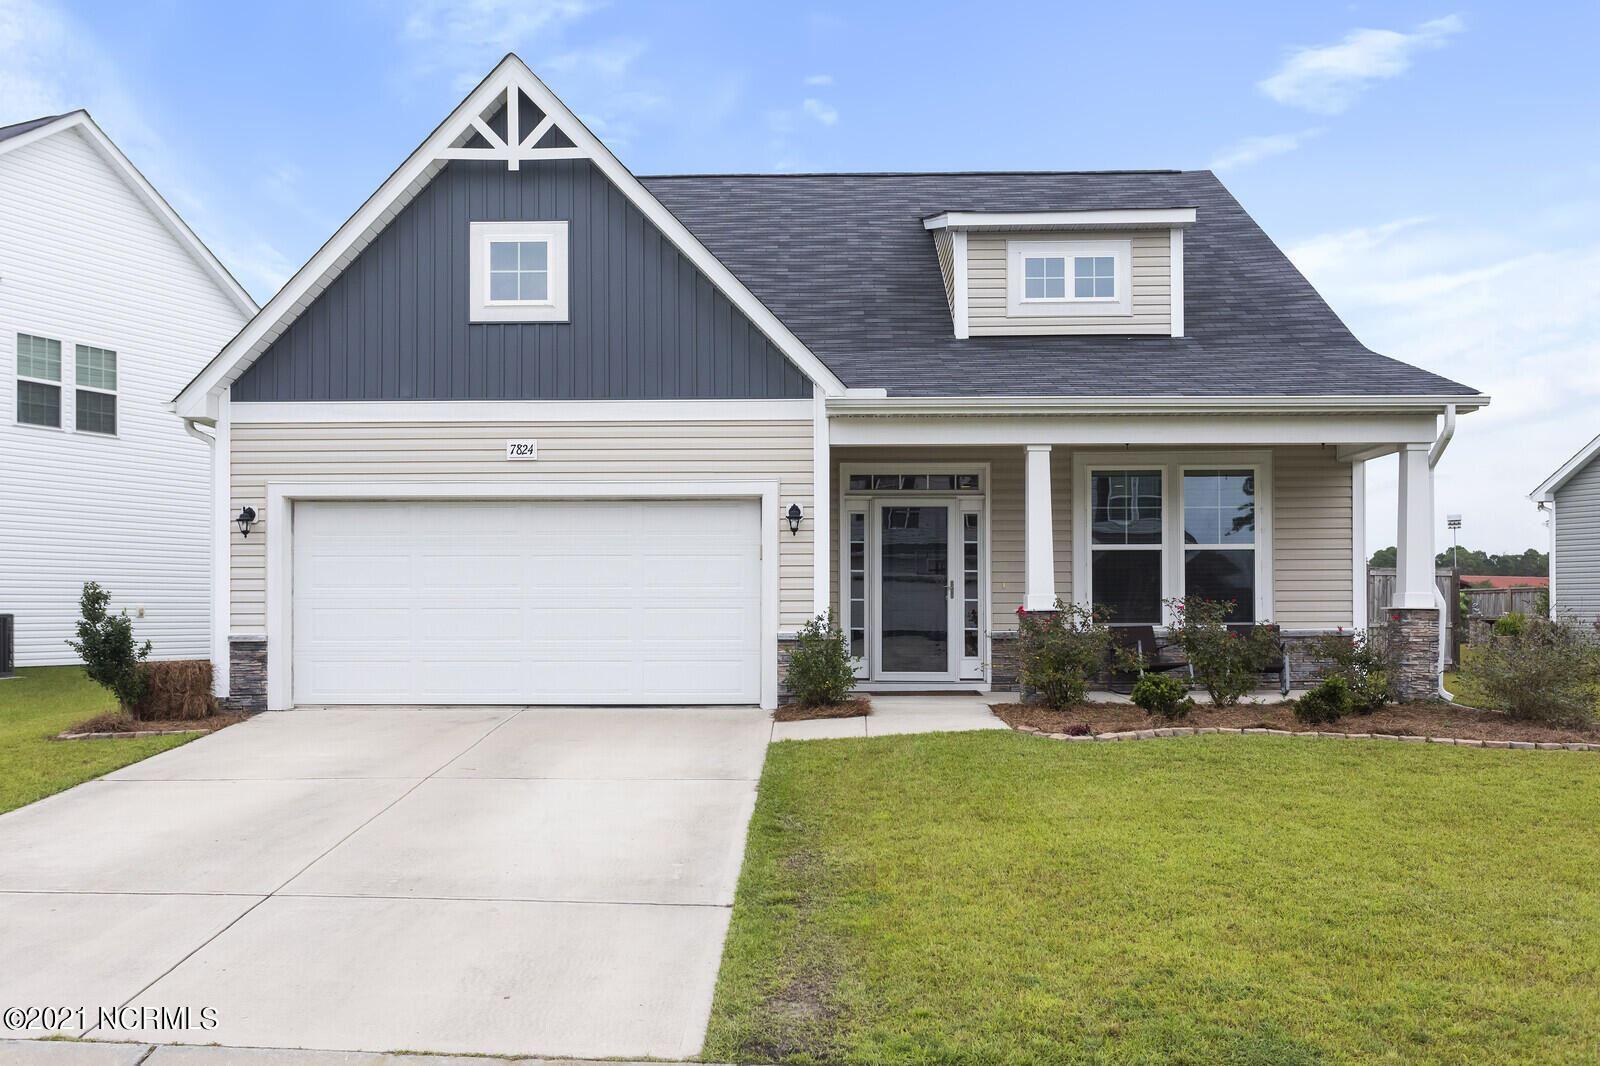 Photo for 7824 Bristlecone Drive, Wilmington, NC 28411 (MLS # 100288692)